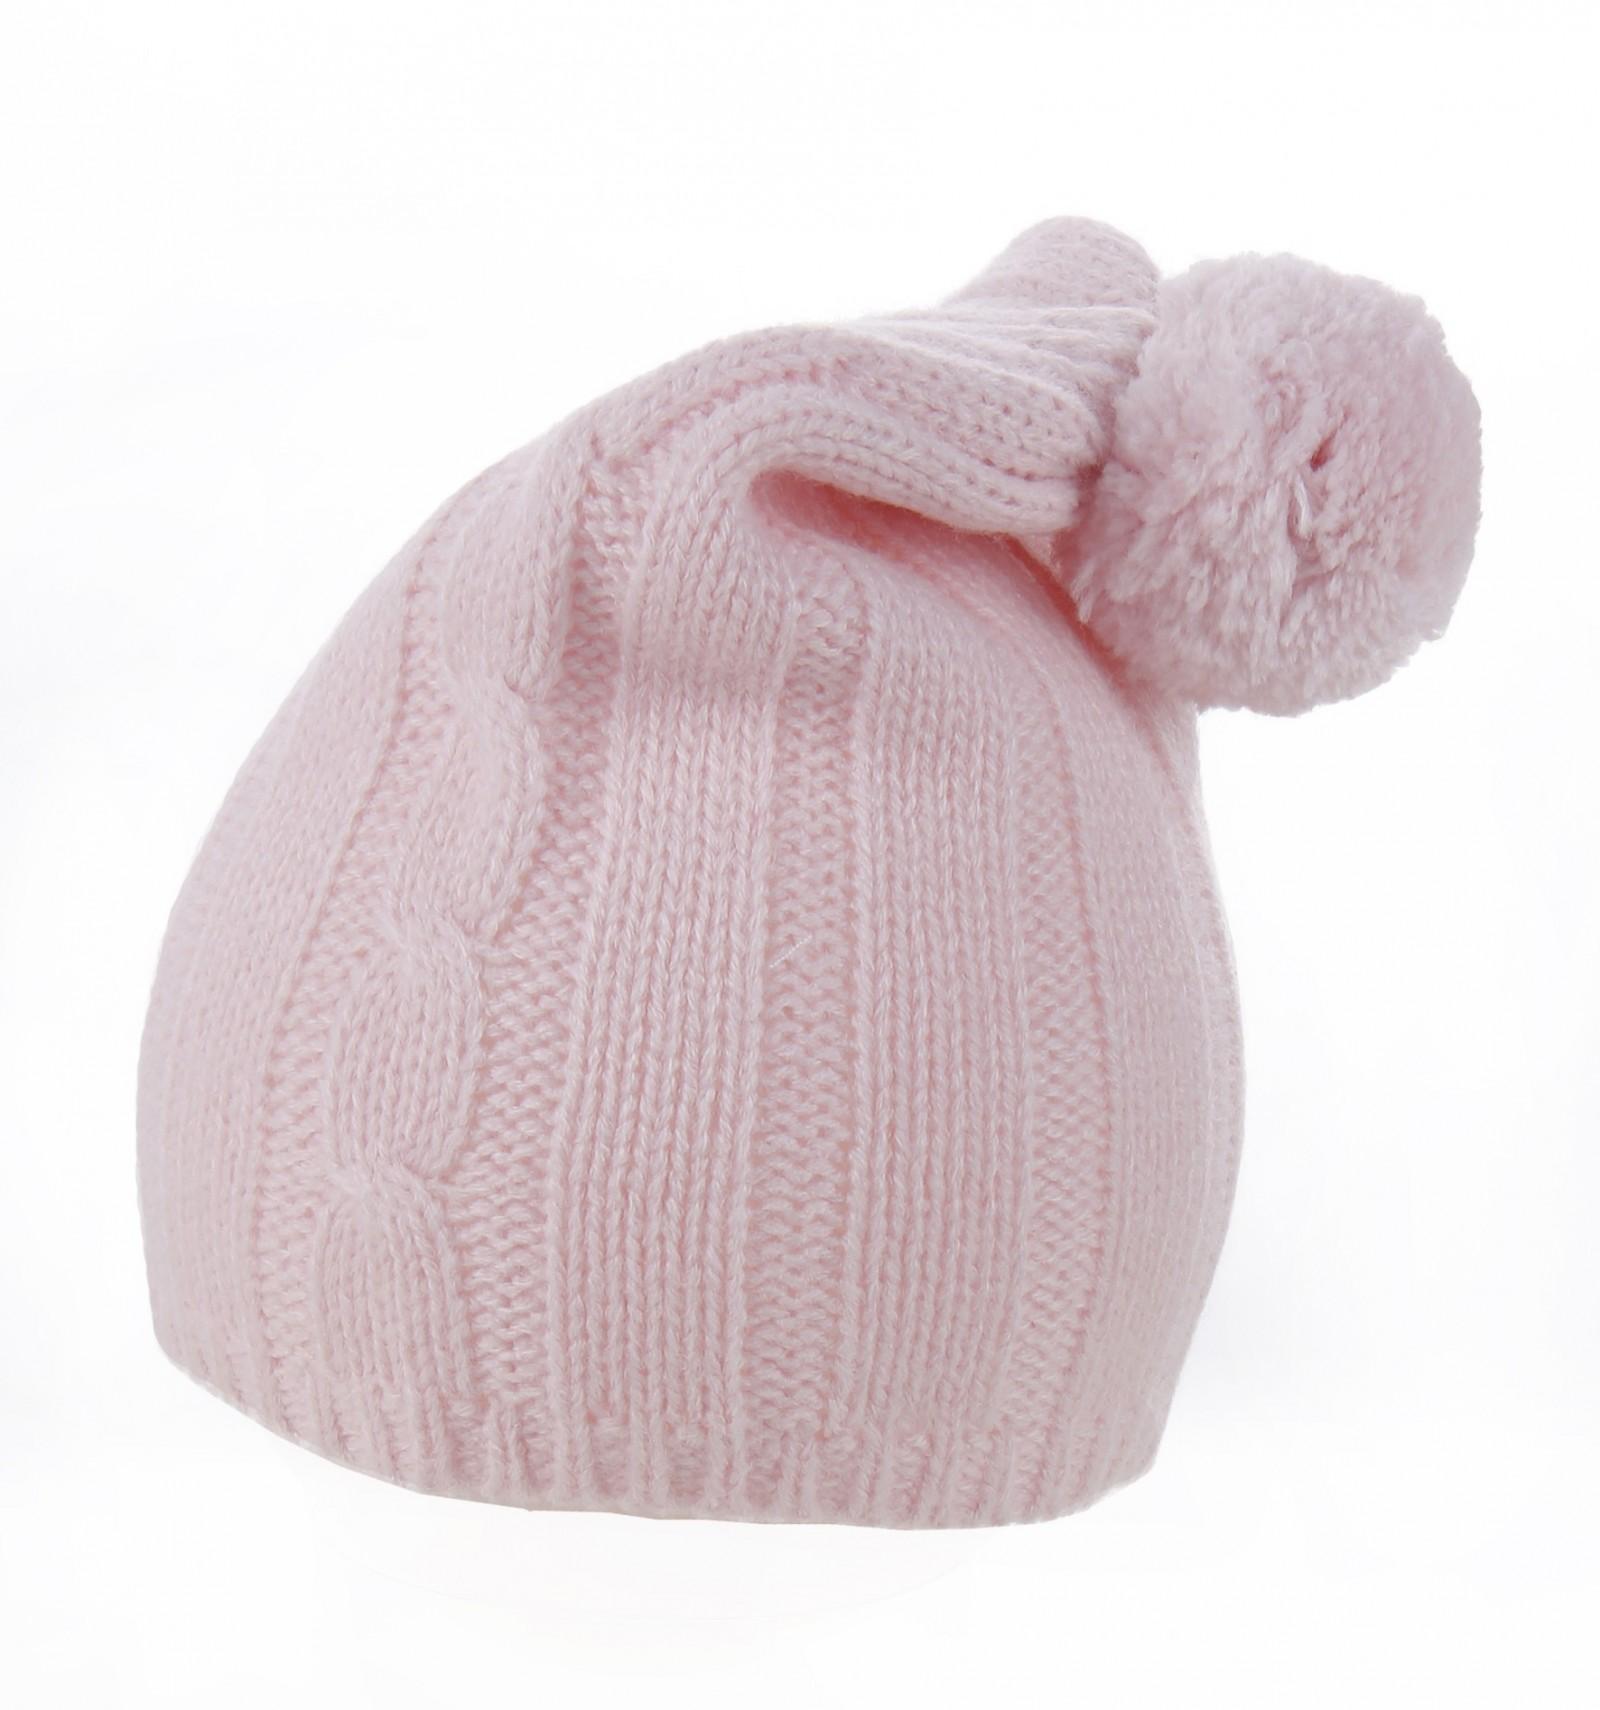 Gorro marfil con bufanda para bebé y niña 9b3b9dd59c4